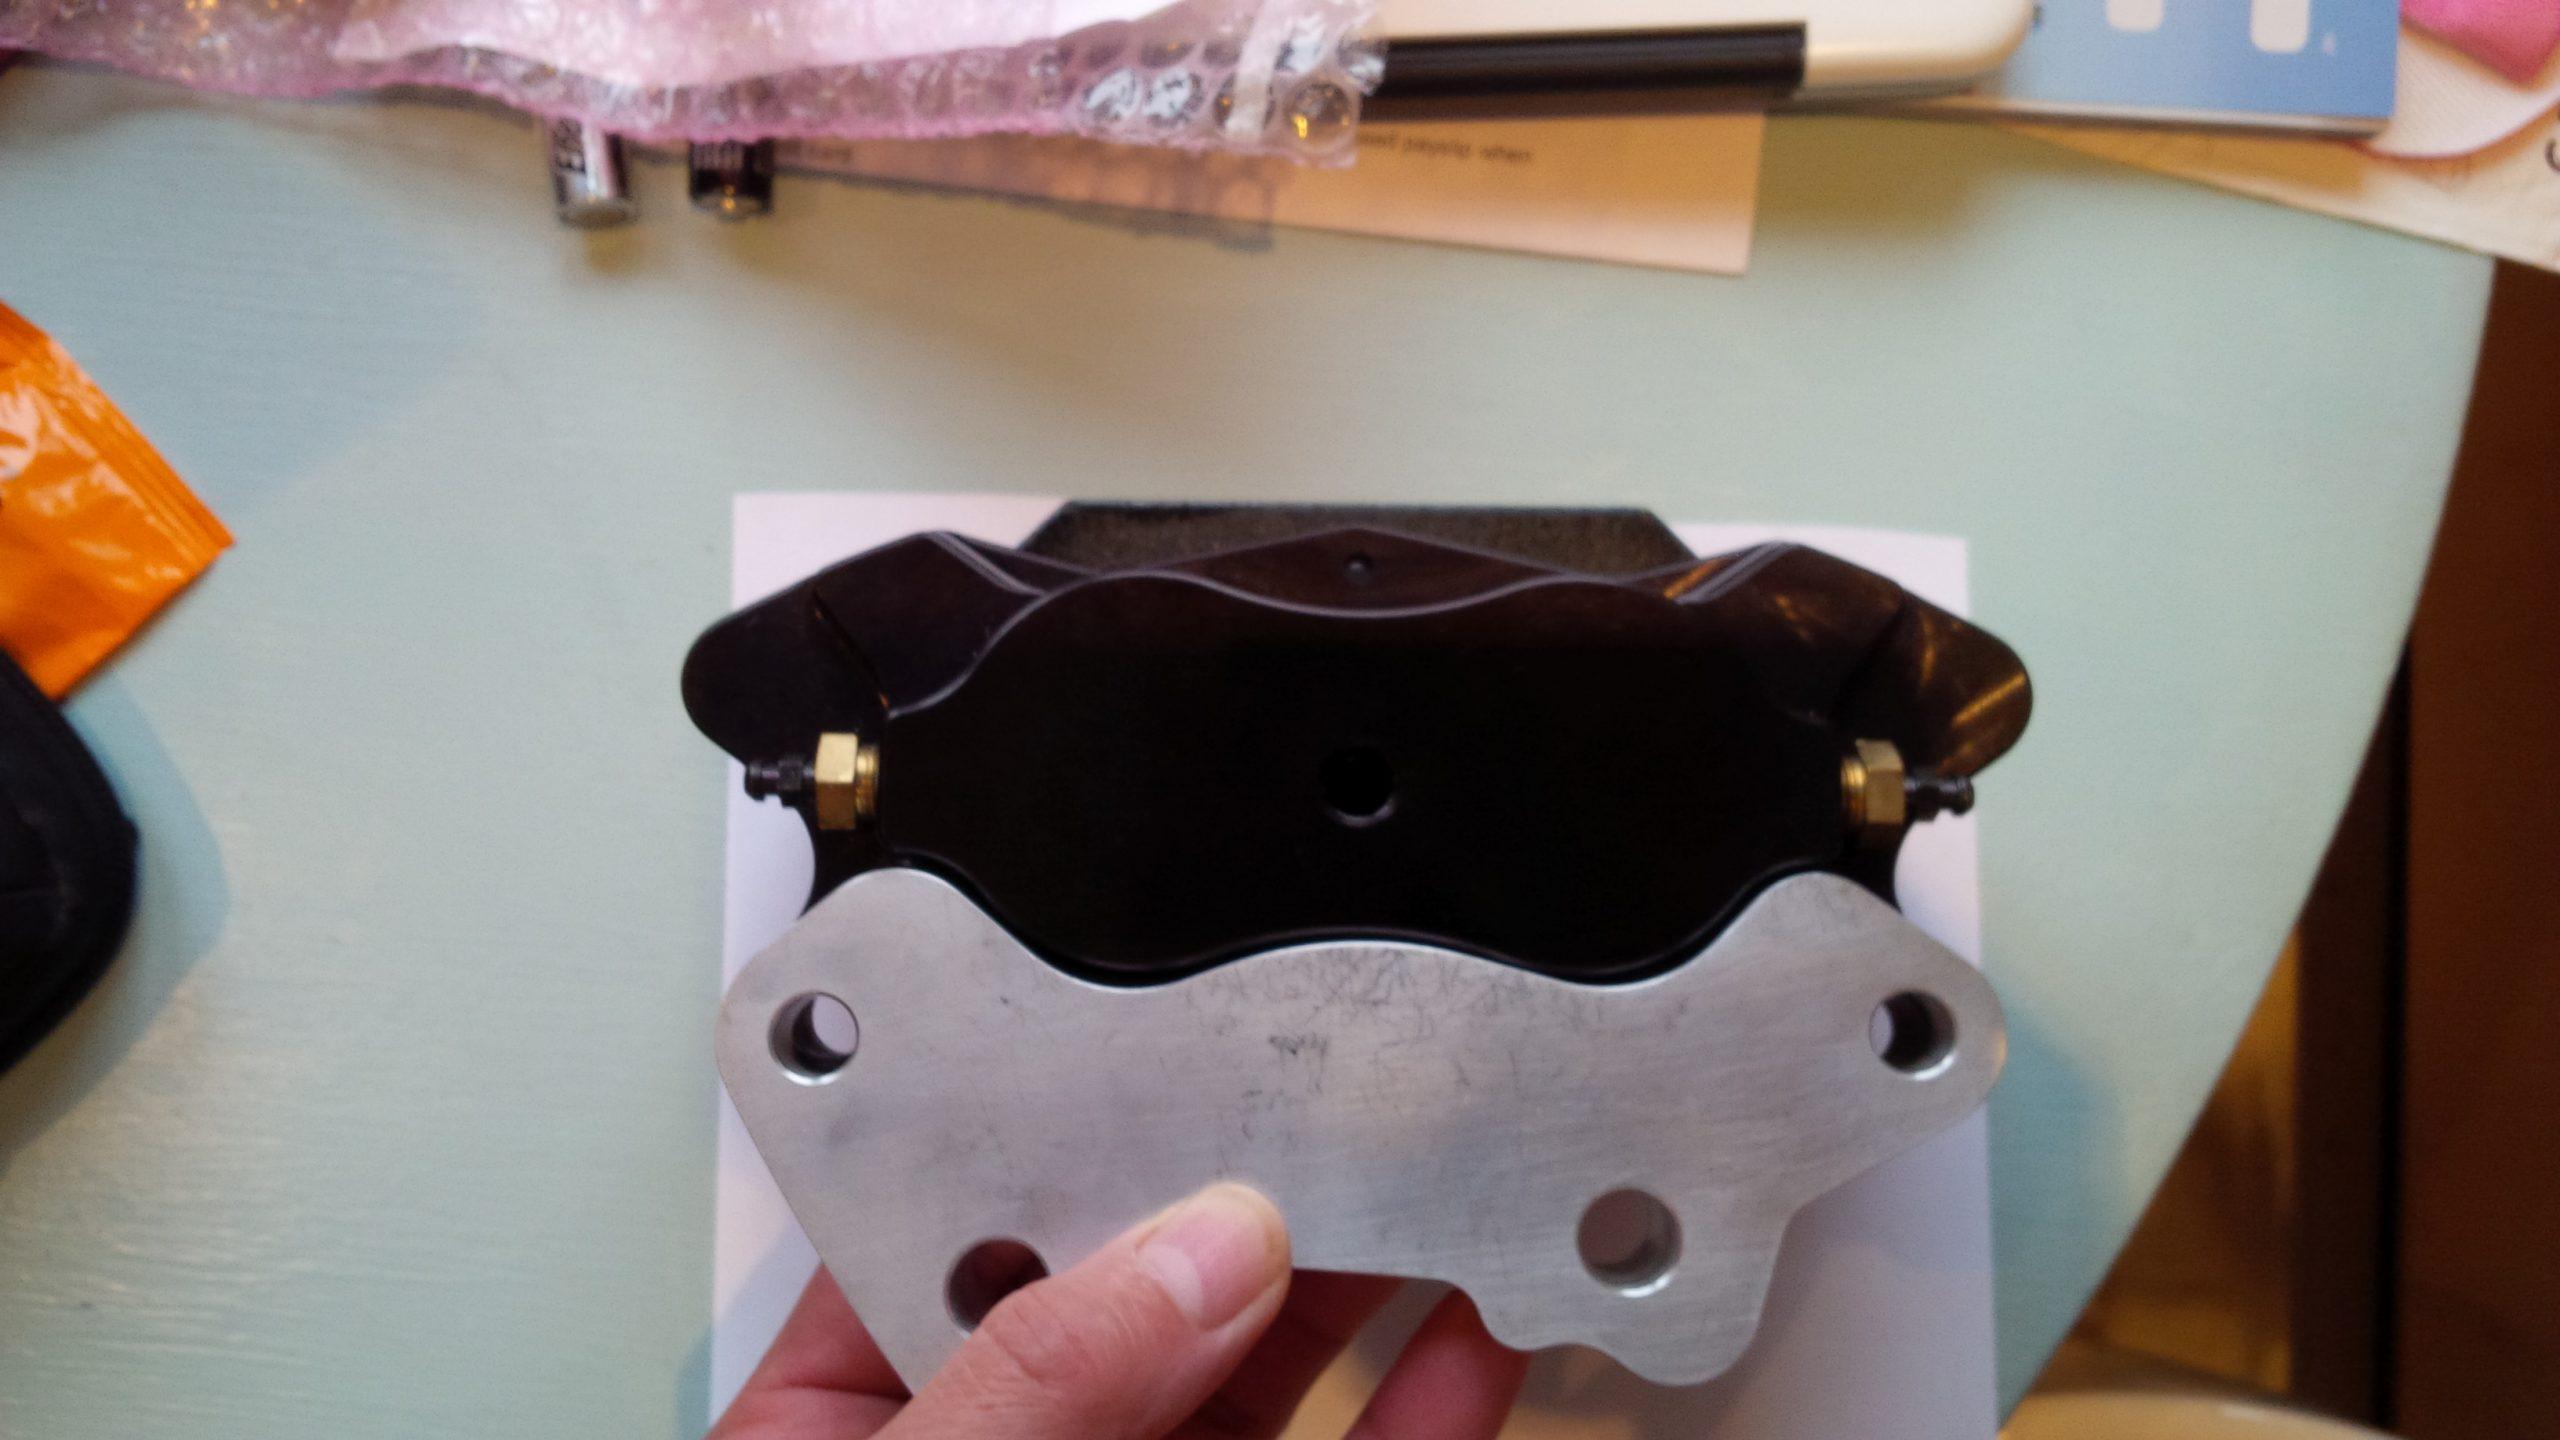 Wilwood brake adapters for Opel manta A series